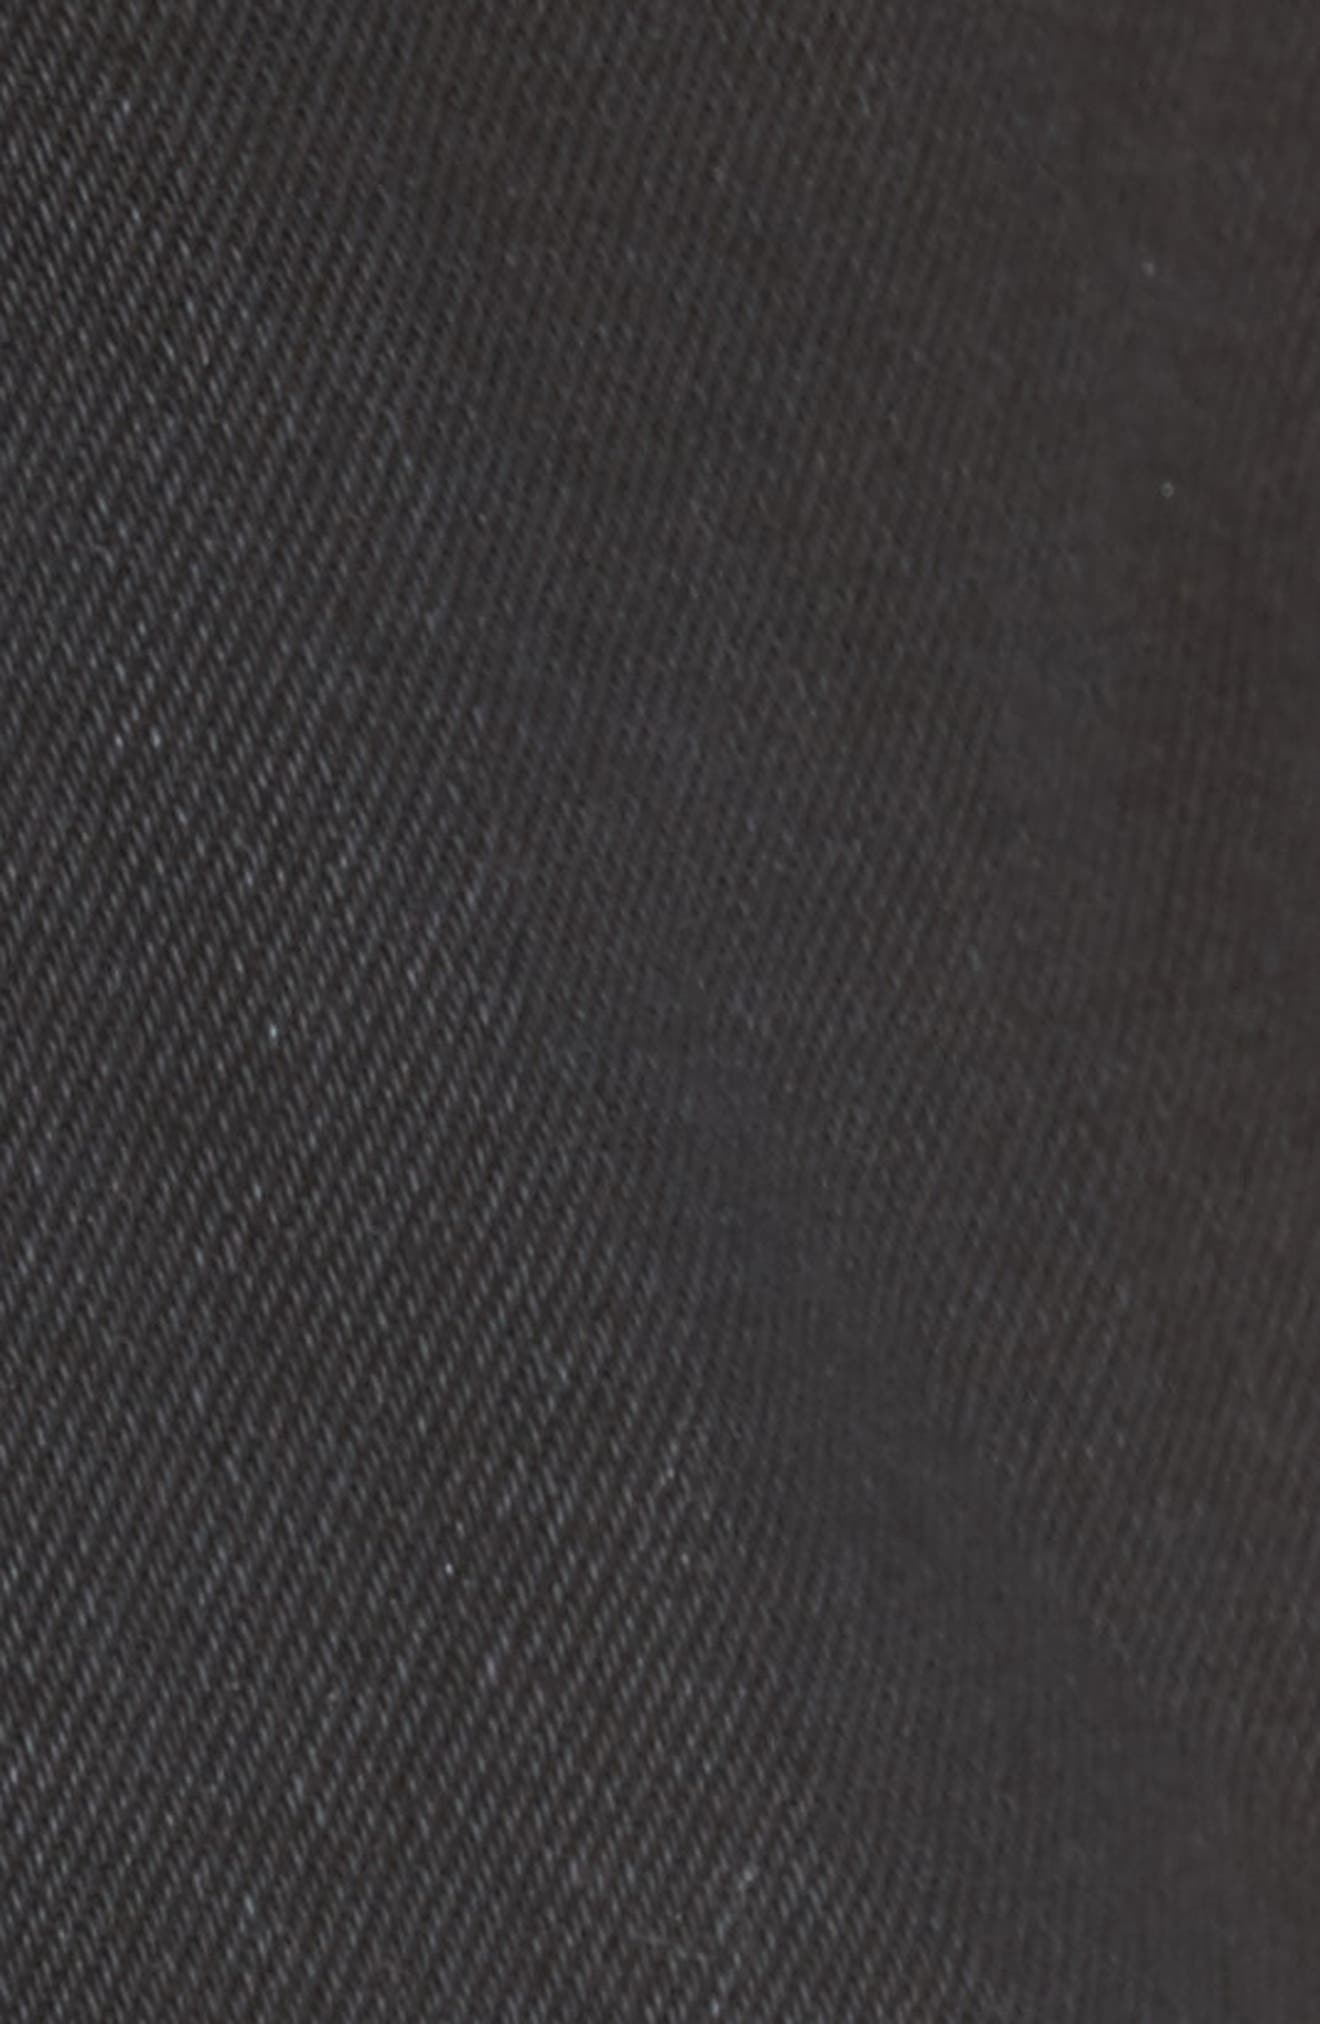 Brandos Relaxed Fit Cutoff Denim Shorts,                             Alternate thumbnail 5, color,